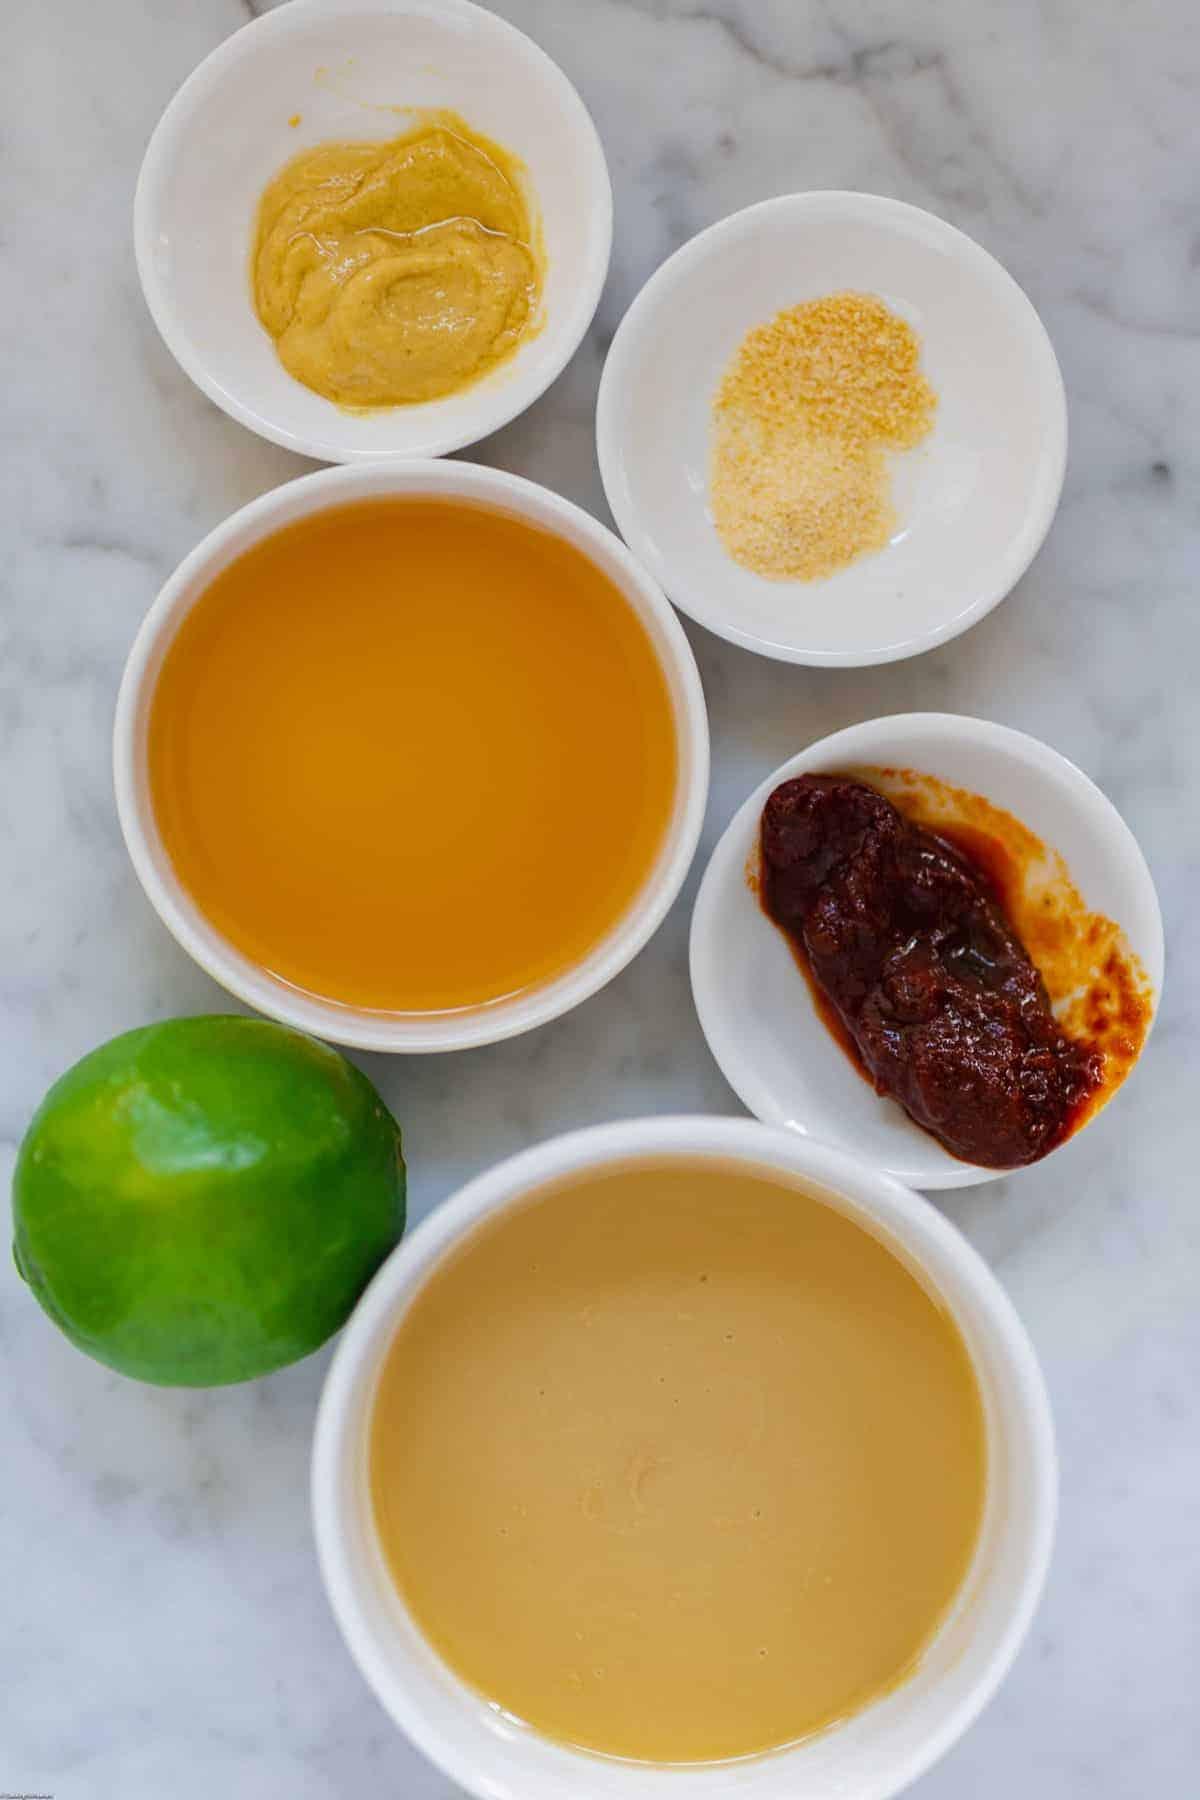 Dijon, onion powder, garlic powder, apple cider vinegar, chipotle in adobo sauce, lime, and tahini for making chipotle-tahini dressing.